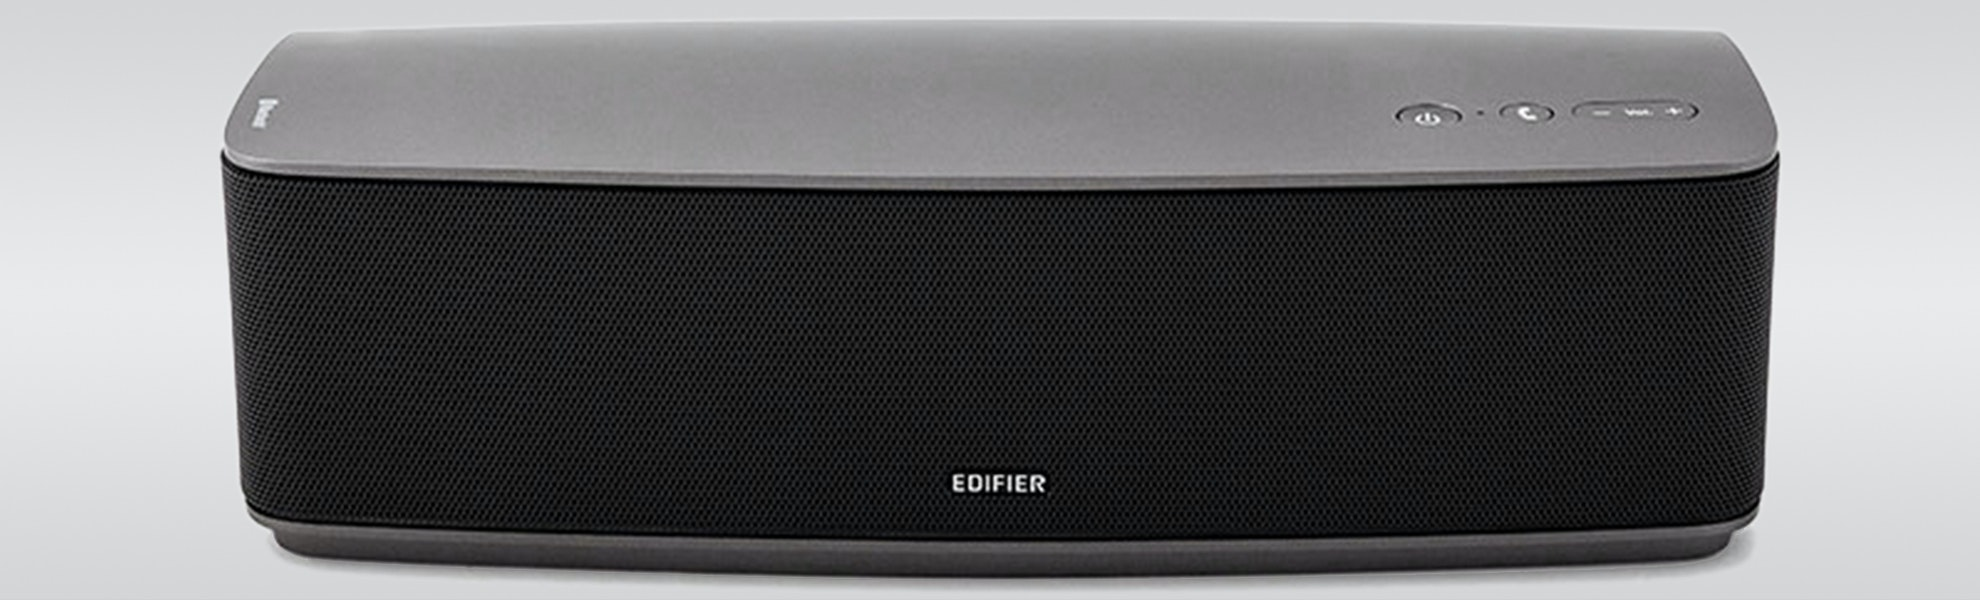 Edifier iF335BT Portable Bluetooth Speaker